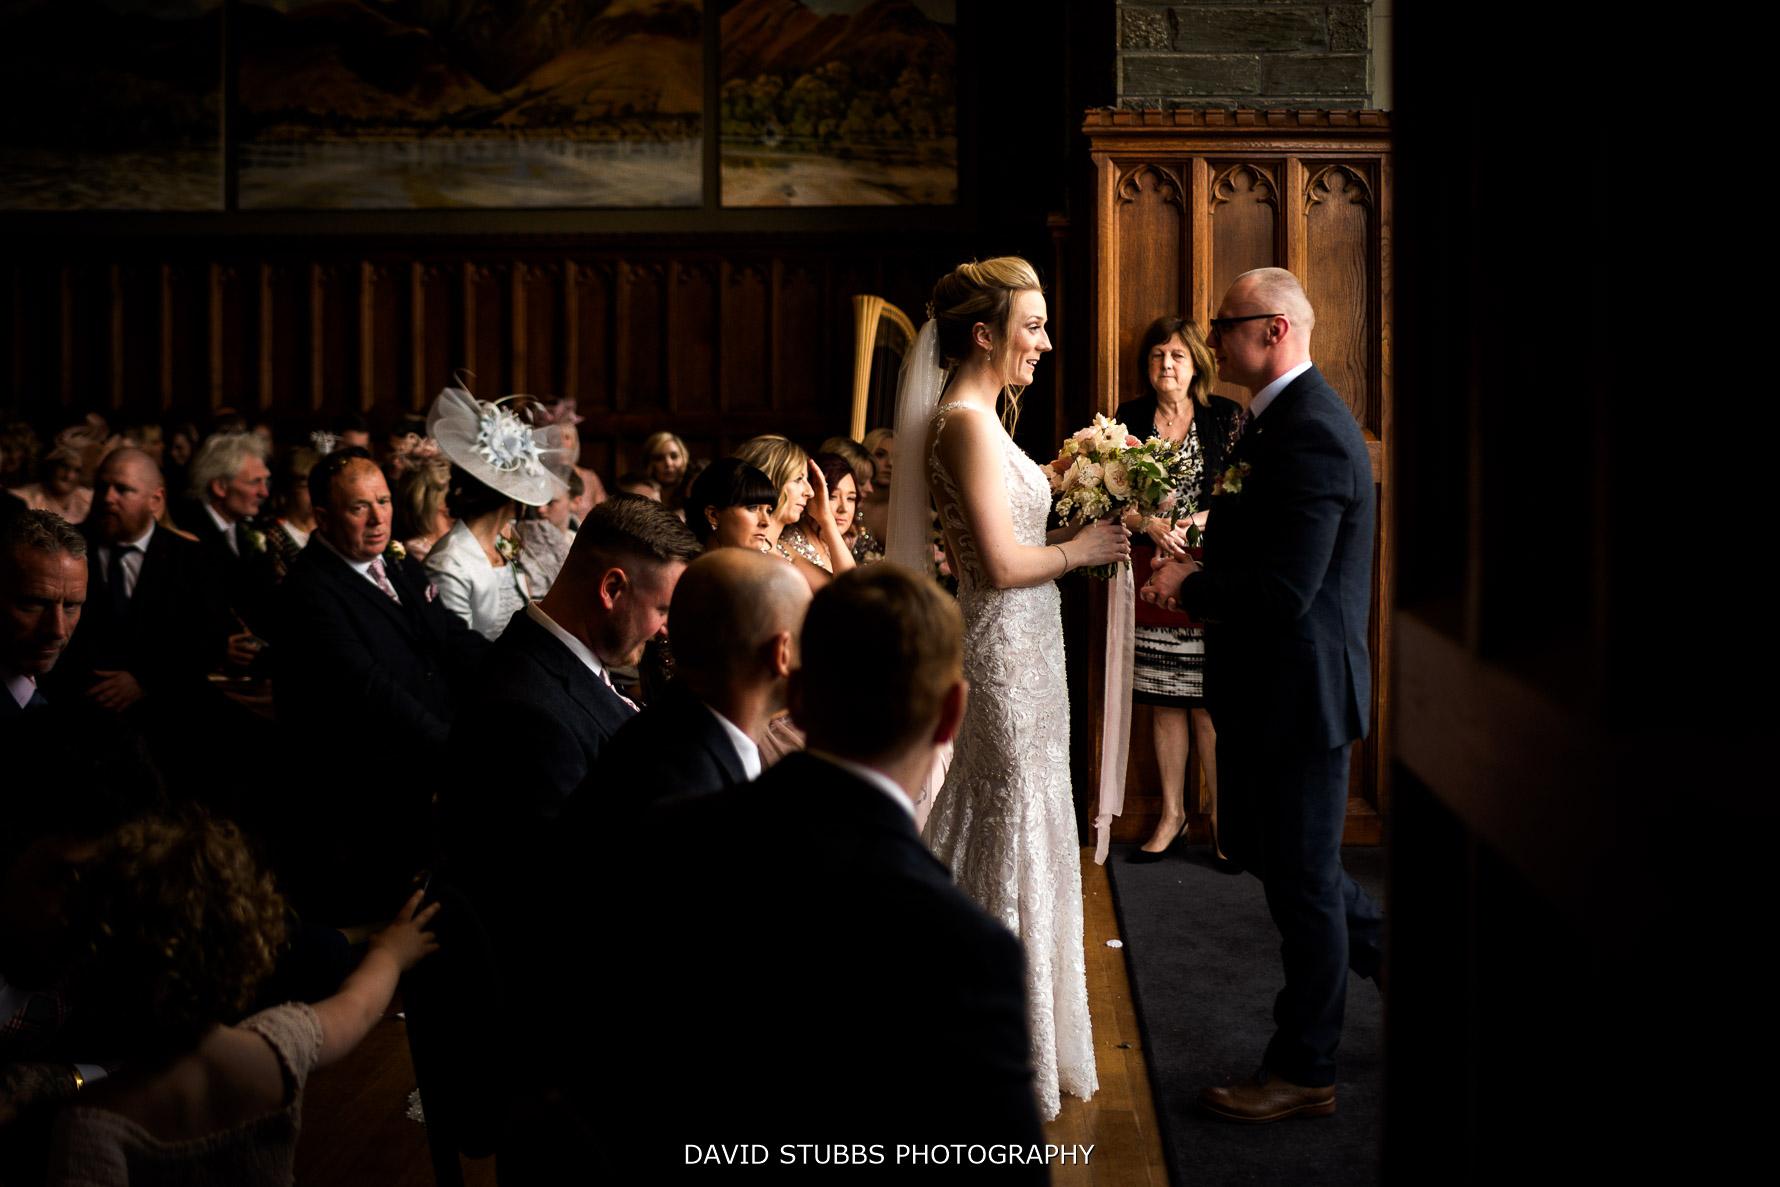 wedding ceremony in stone room at lingholm estate